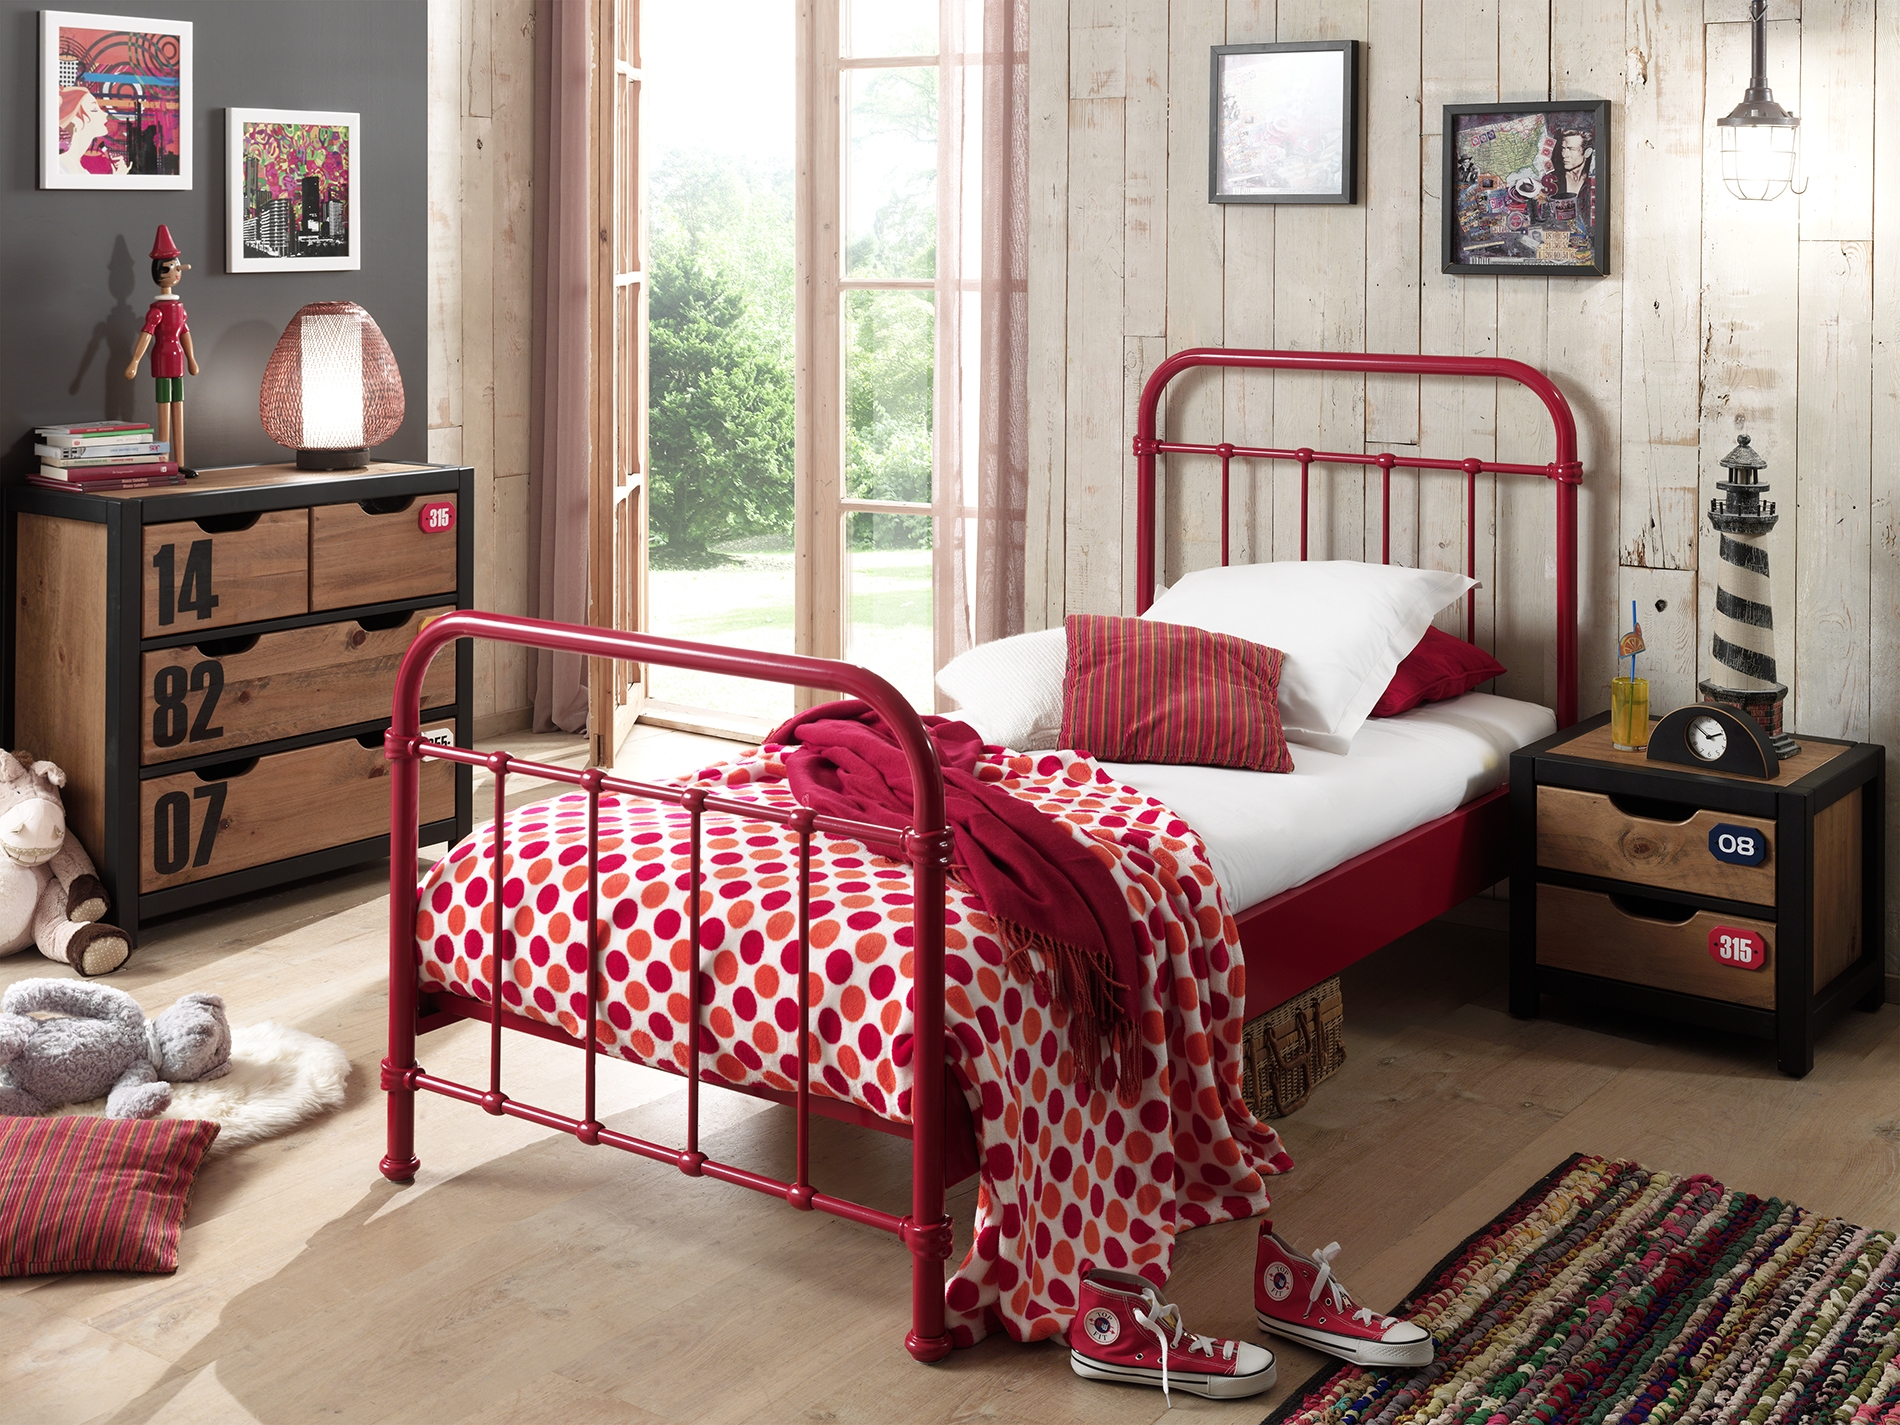 Set Mobila dormitor din lemn de pin si MDF cu pat metalic, pentru copii 3 piese New York Rosu / Natural, 200 x 90 cm imagine